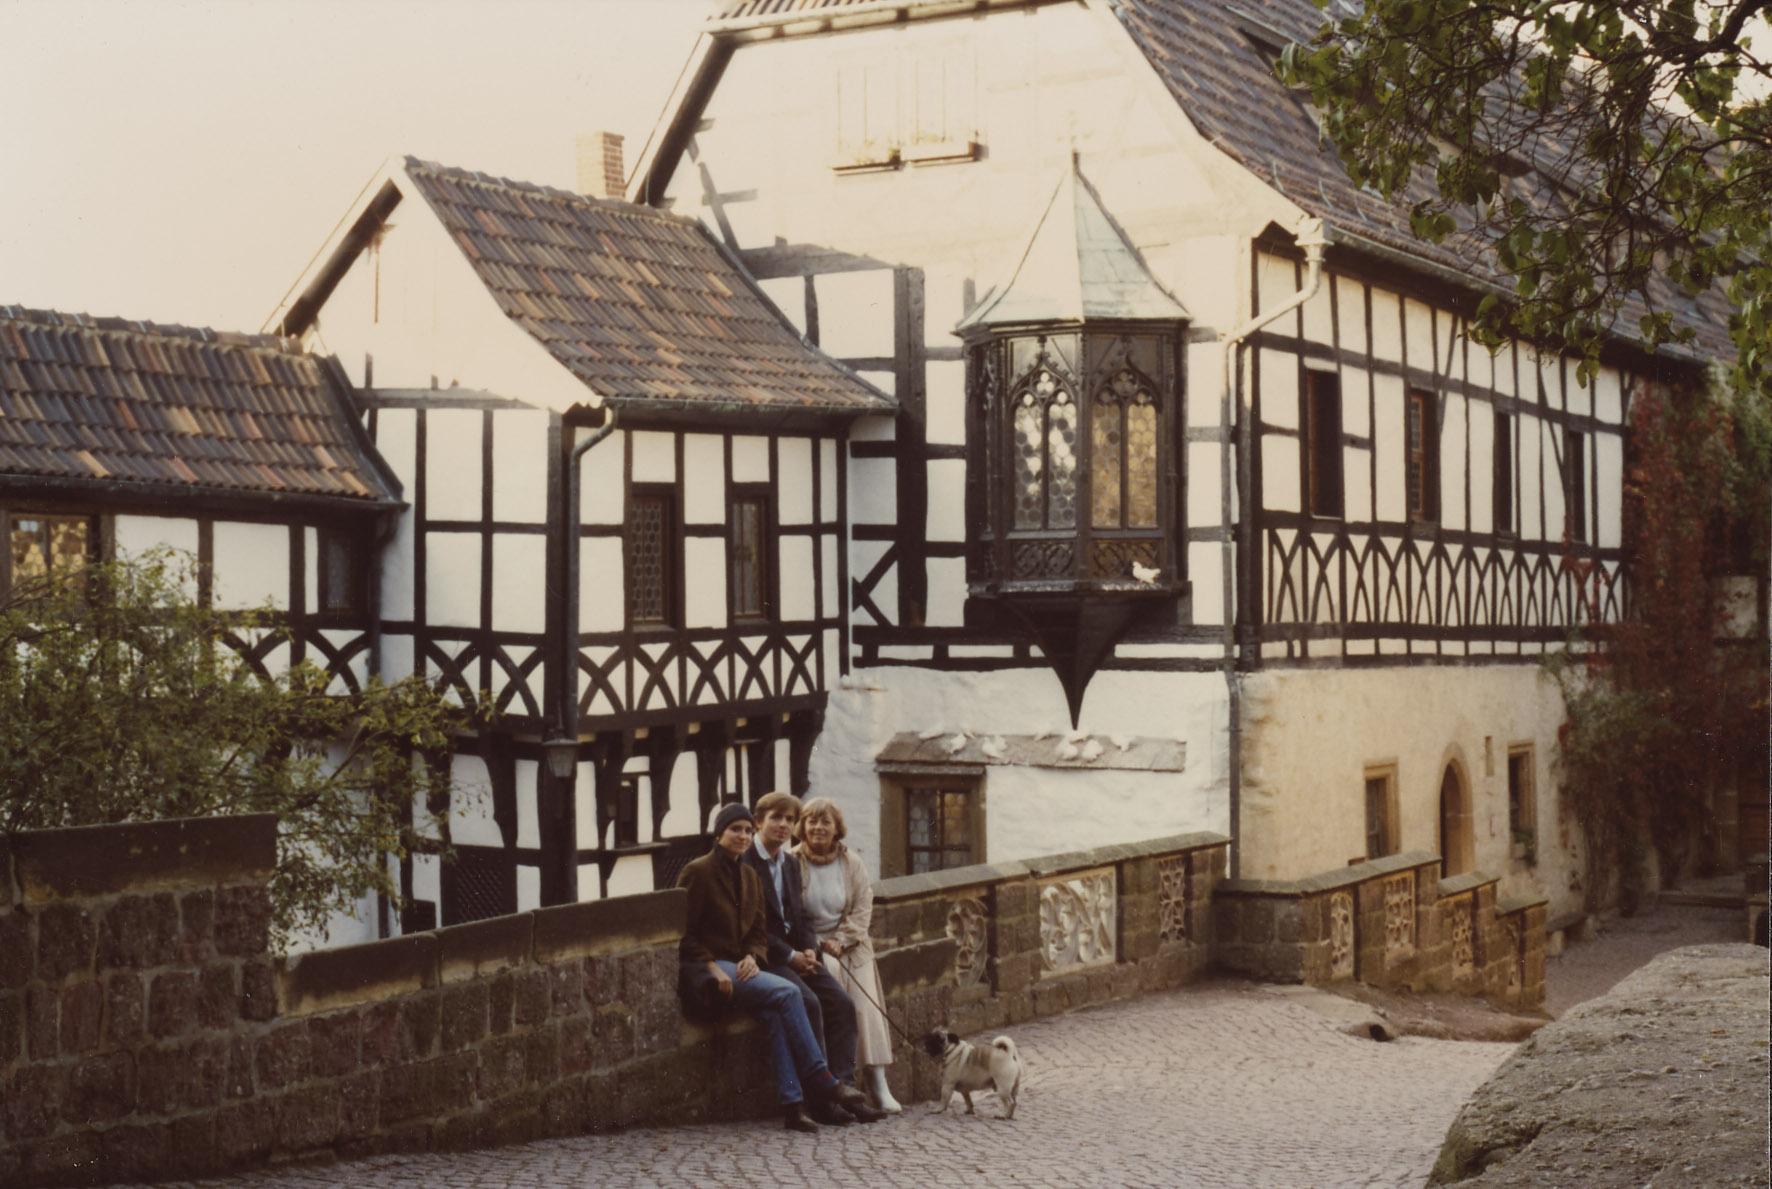 Willy Gursky. Eisenach. Familienausflug. 05.11.1989.